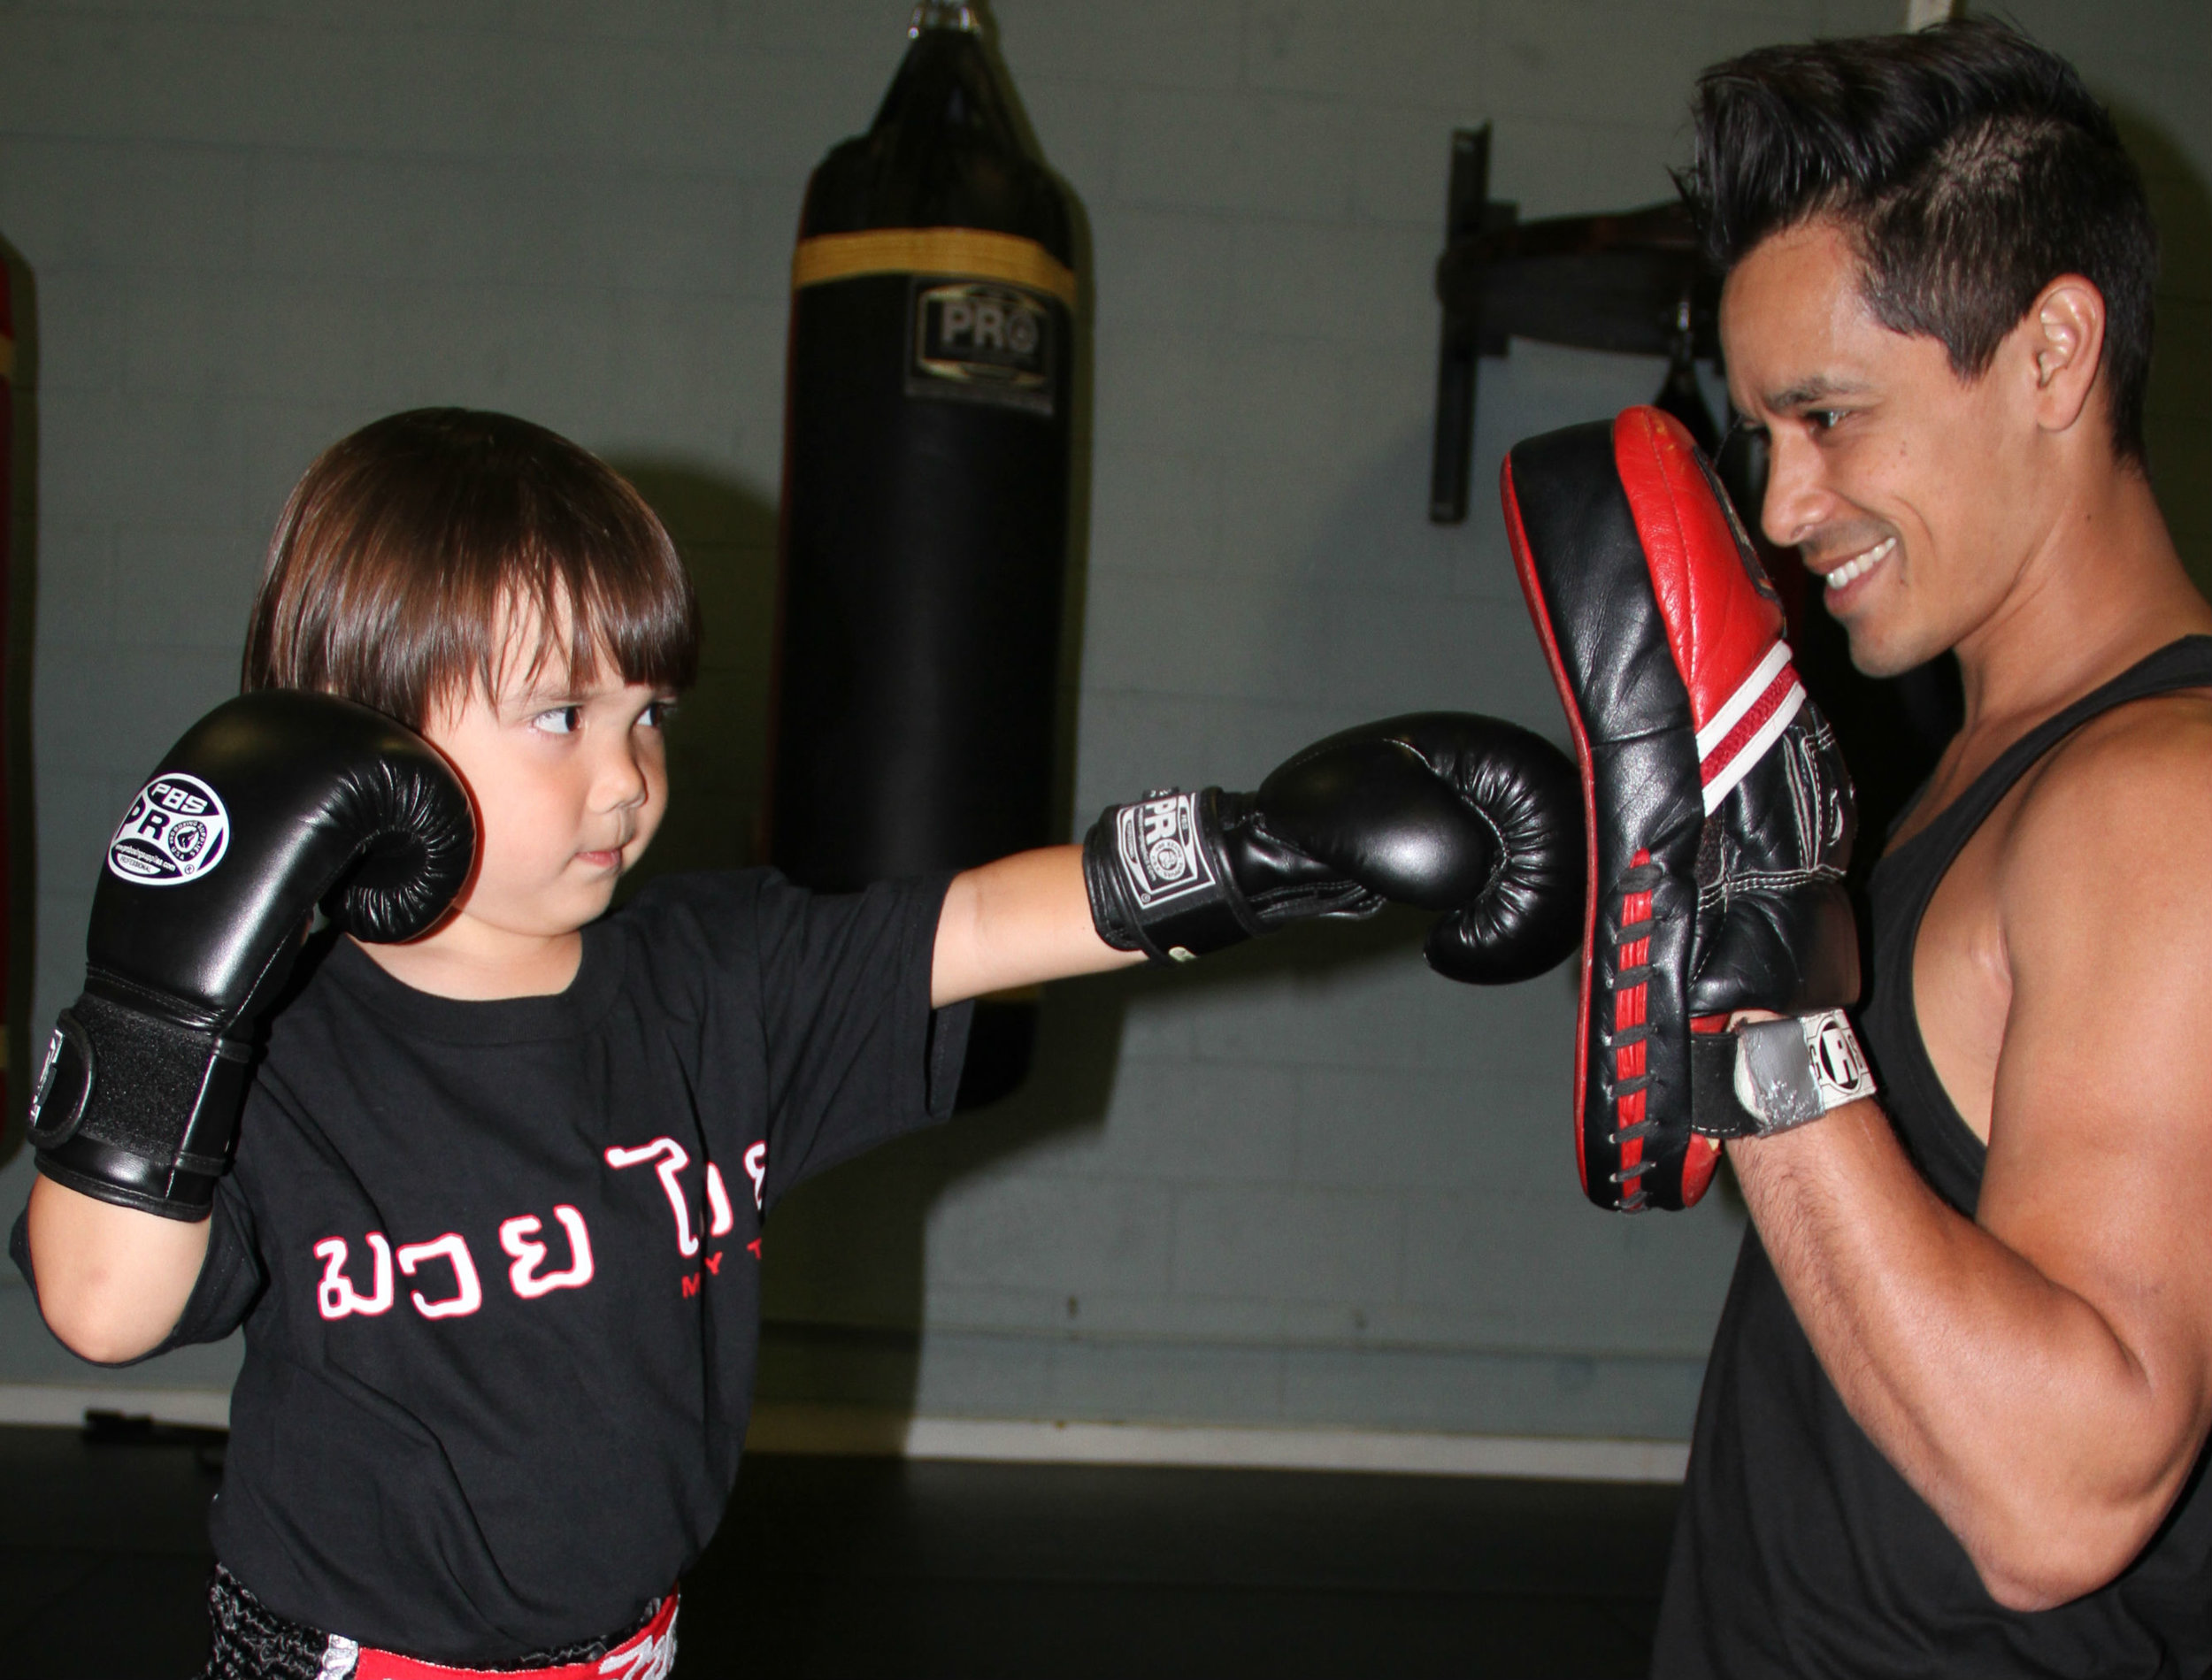 kid punch.jpg